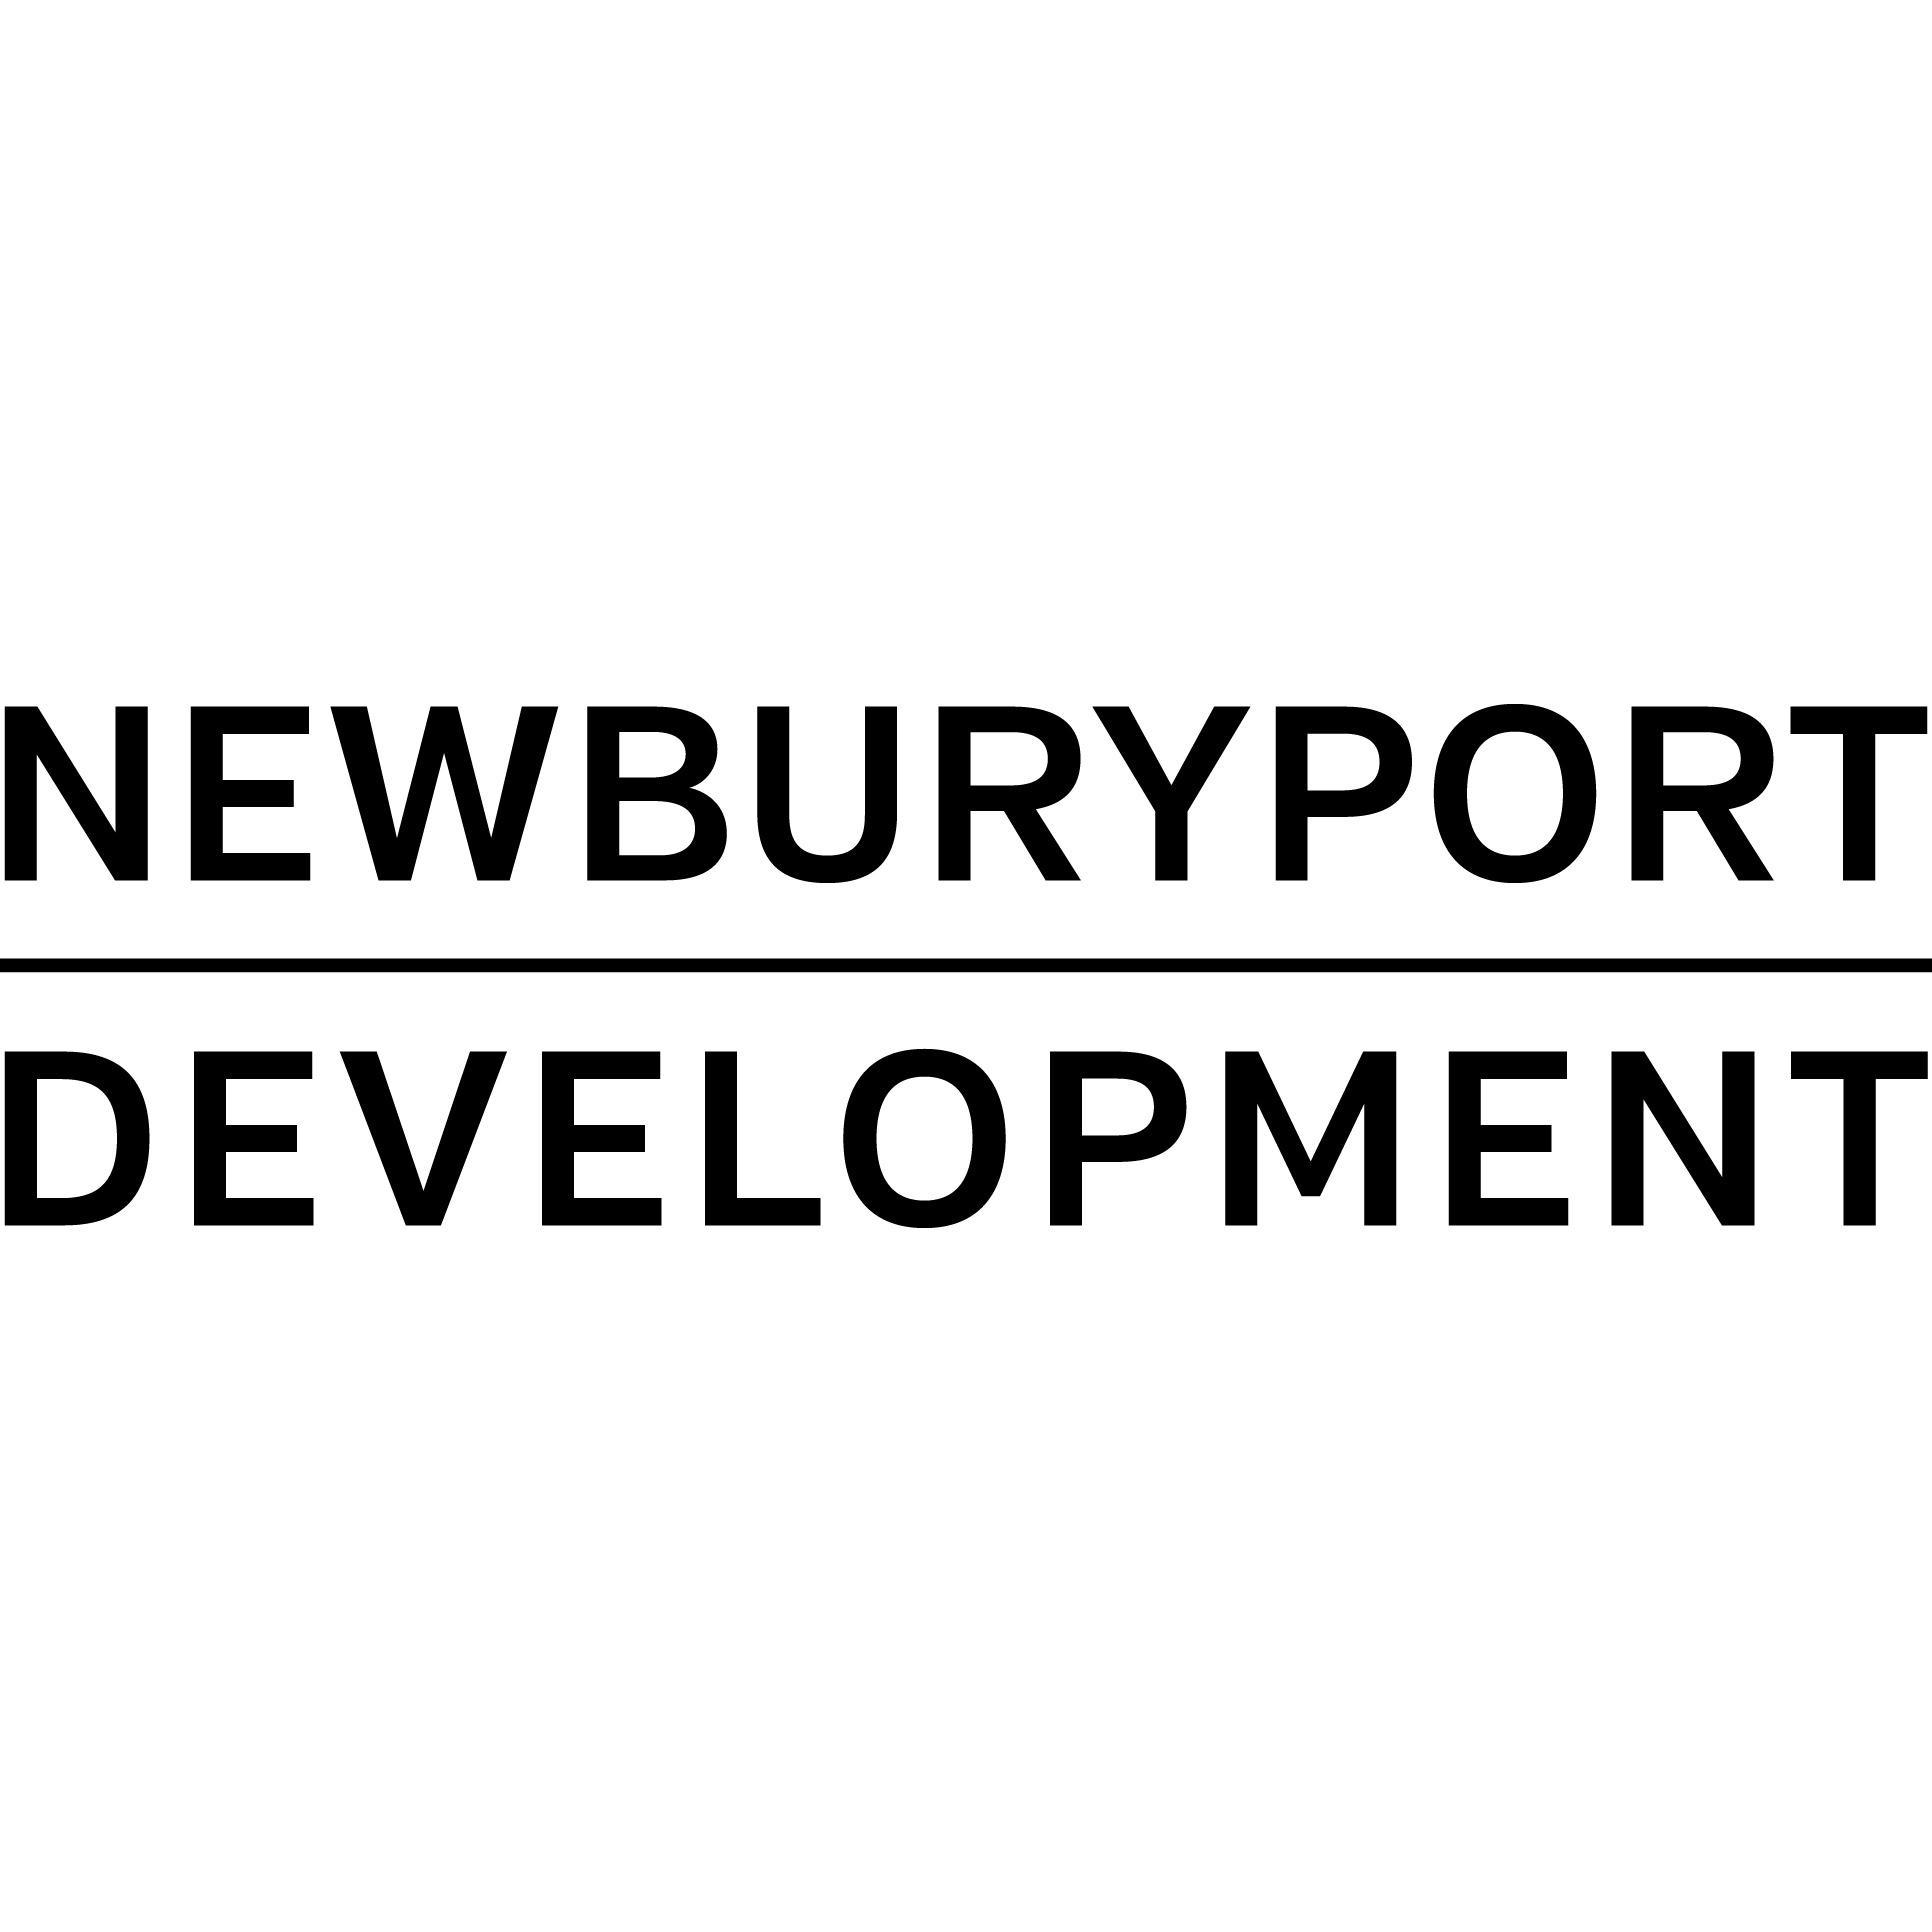 Newburyport Development - Newburyport, MA - Property Management